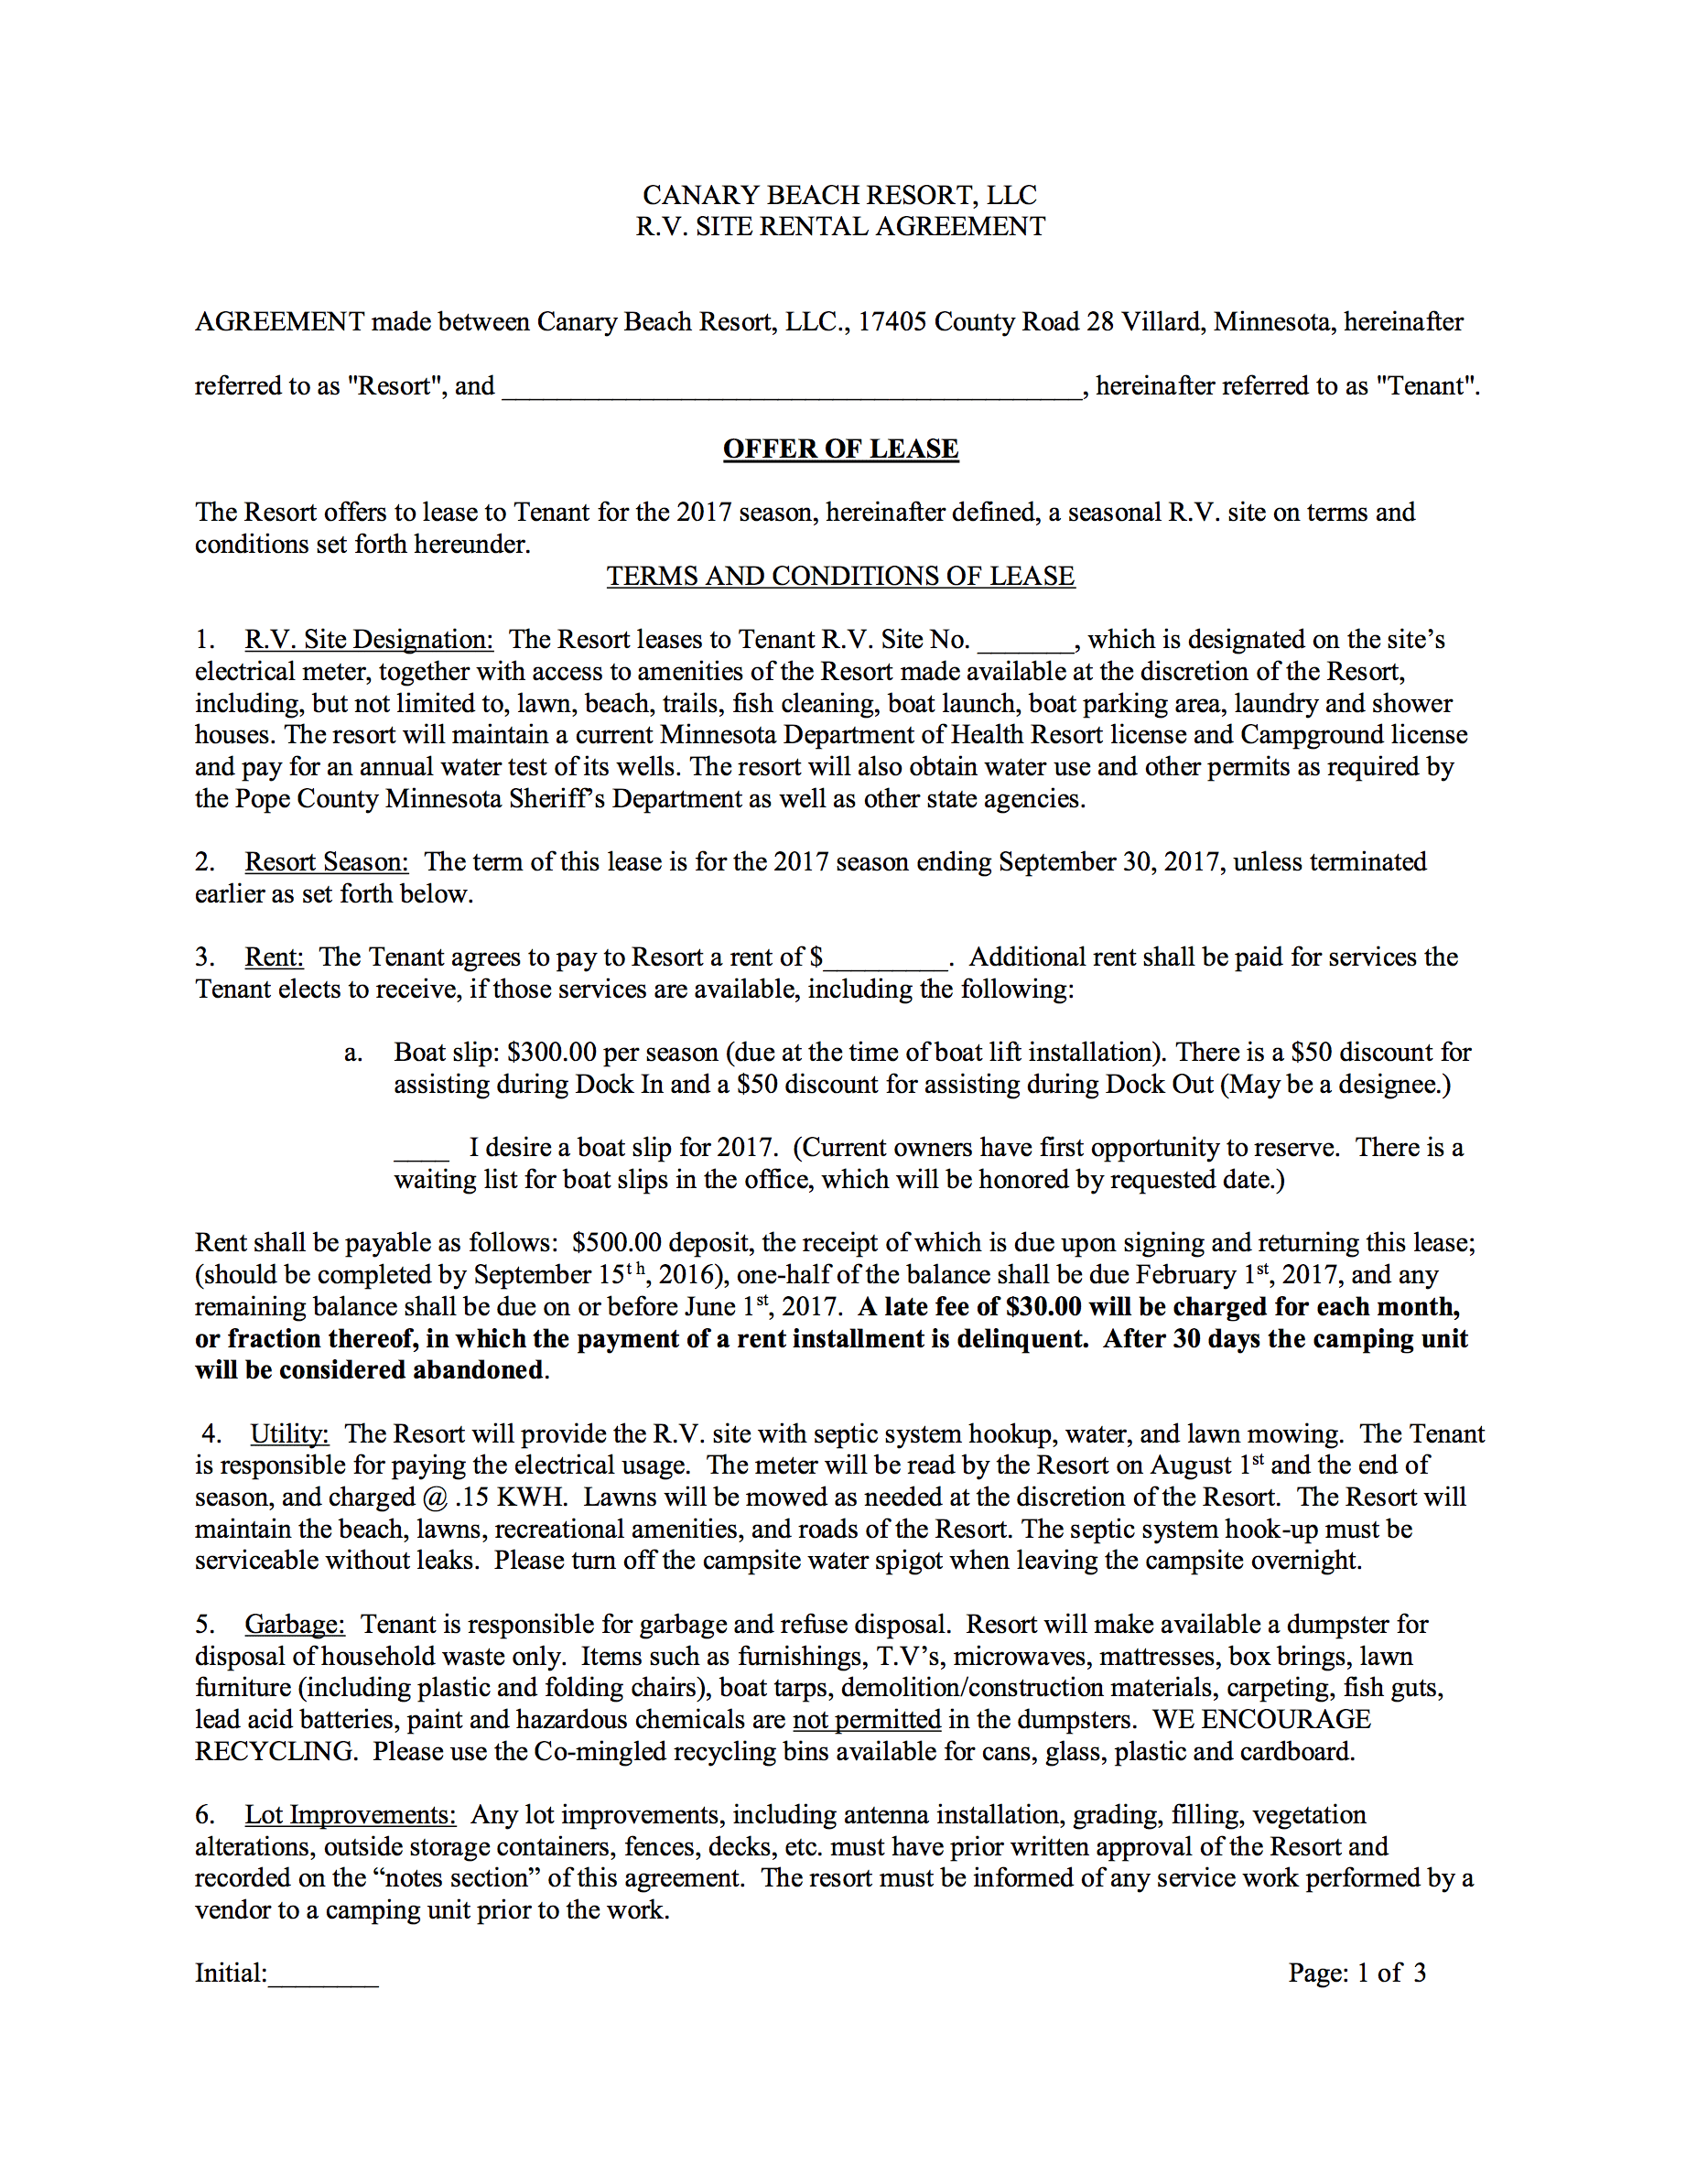 2017 Seasonal Camping Contract